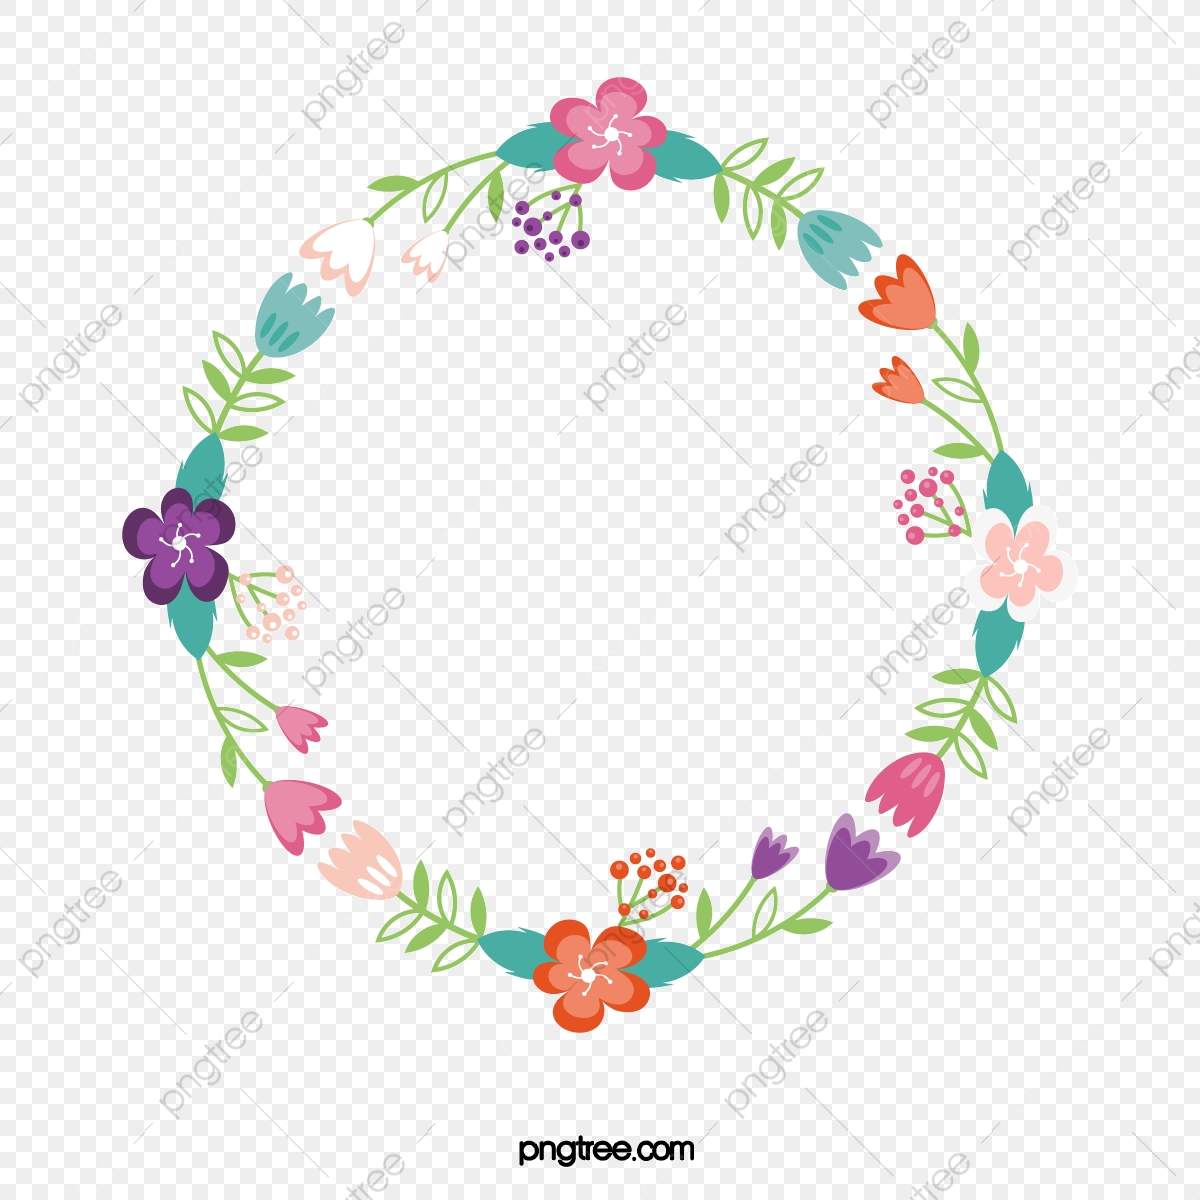 Desenhos De Flor Romantica Vector Png Flores Coloridas A Cor